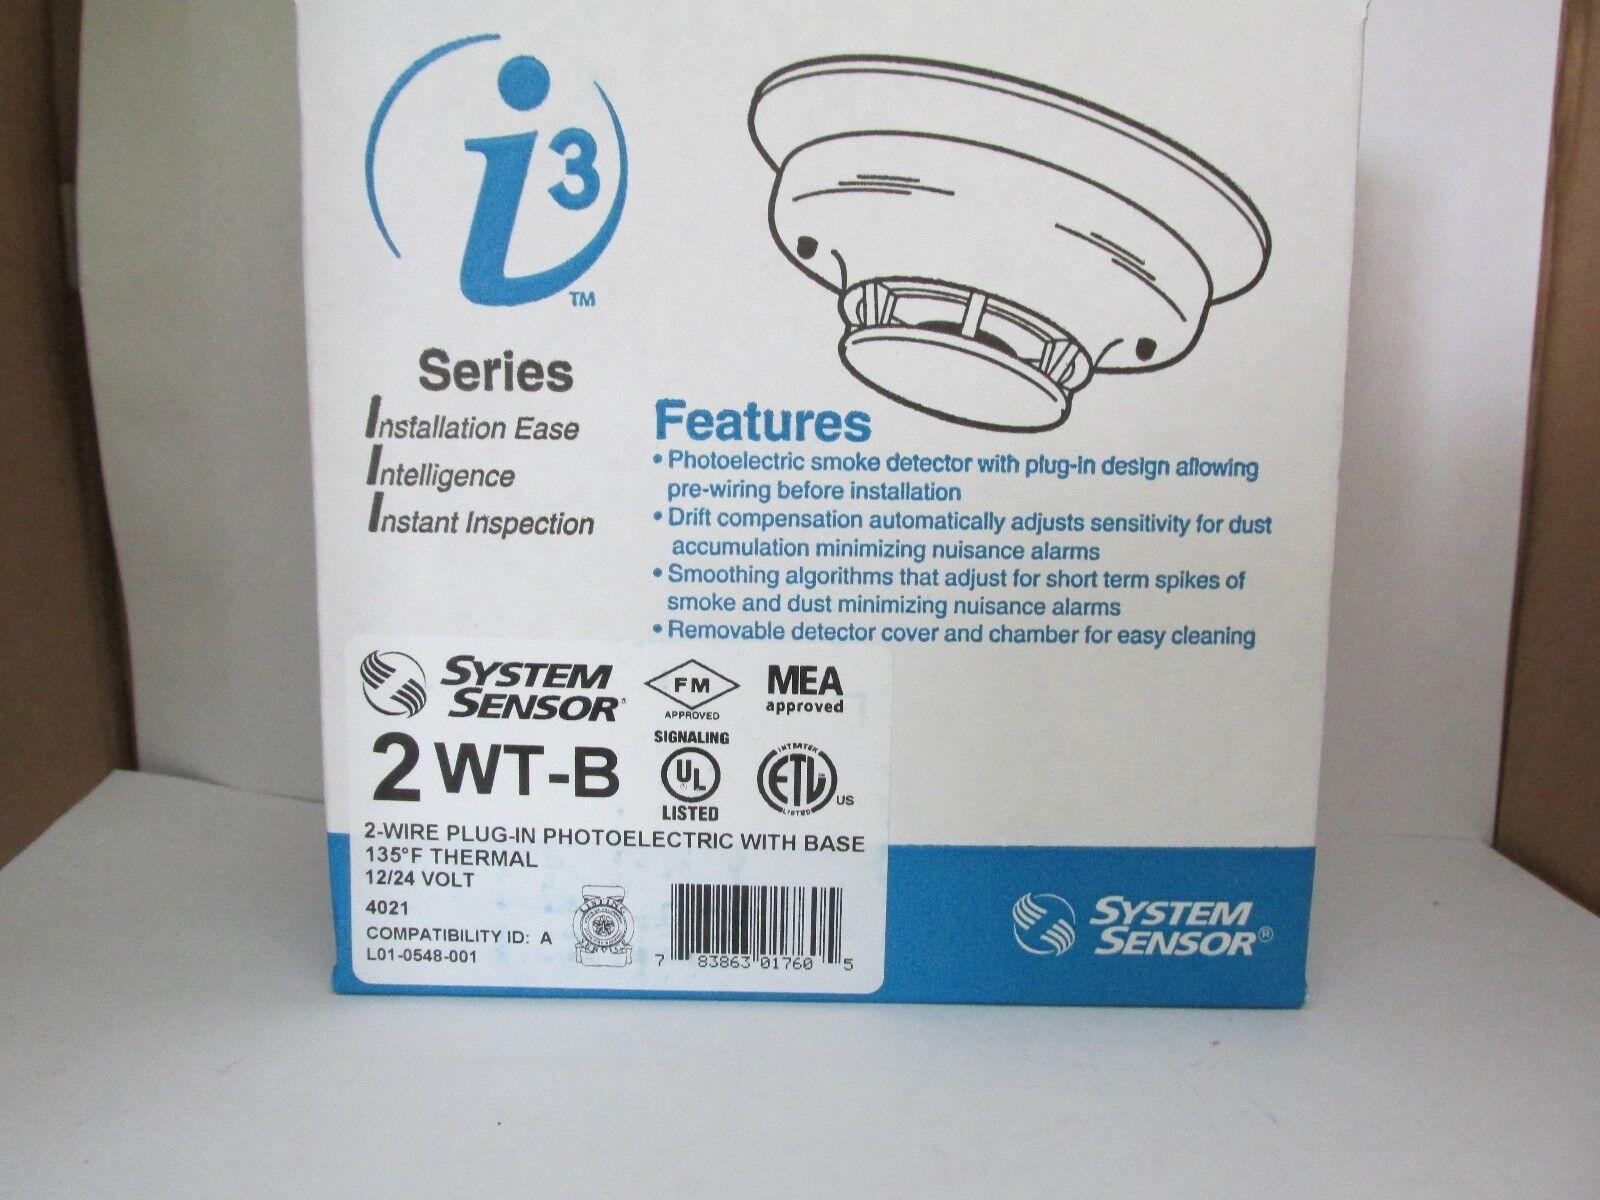 System Sensor 2wt-b 2-wire Photoelectric I3 Smoke Detector 135f | eBay